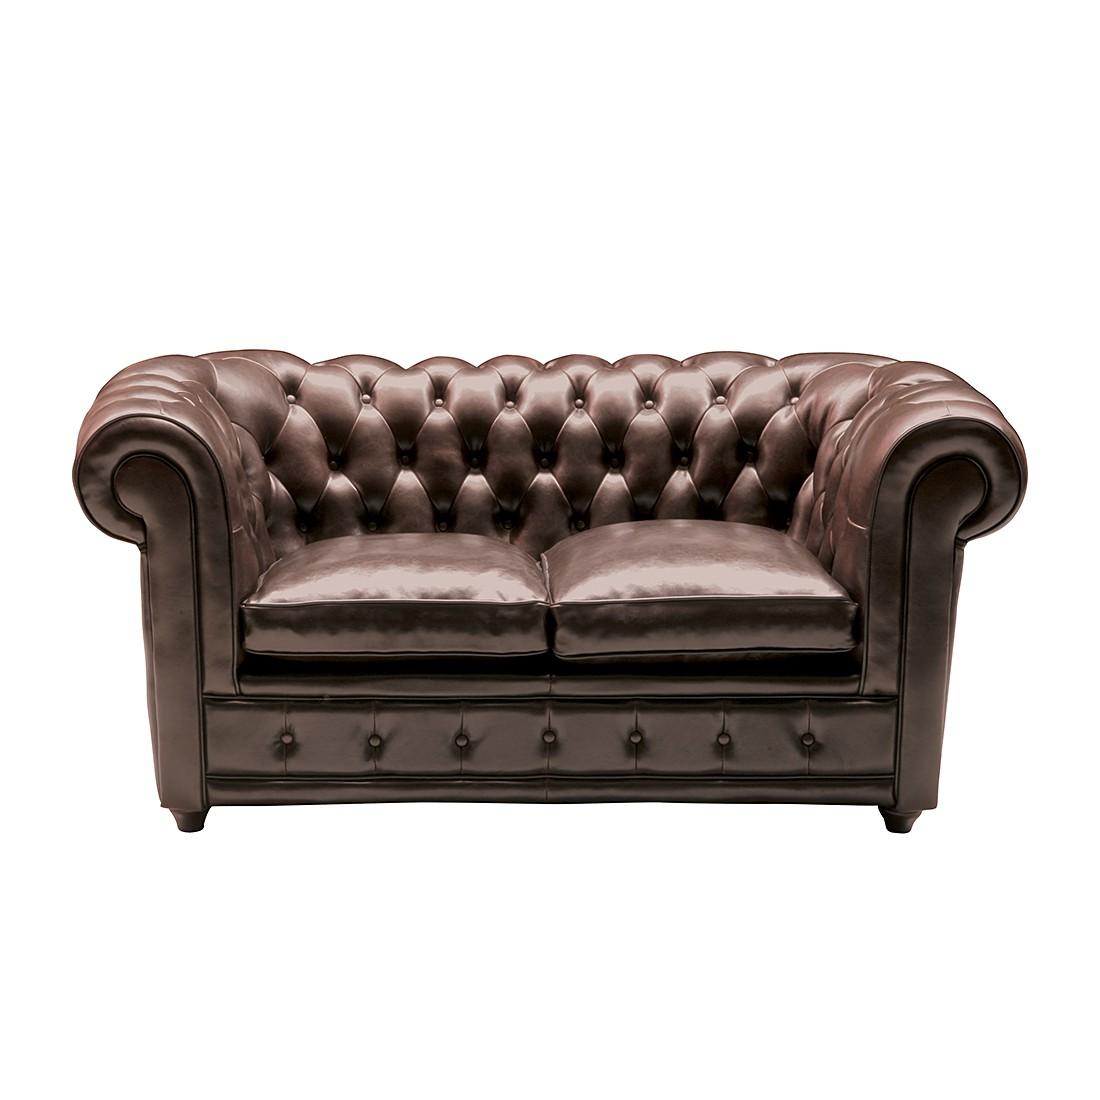 Sofa Oxford (2-Sitzer) - Echtleder Dunkelbraun, Kare Design